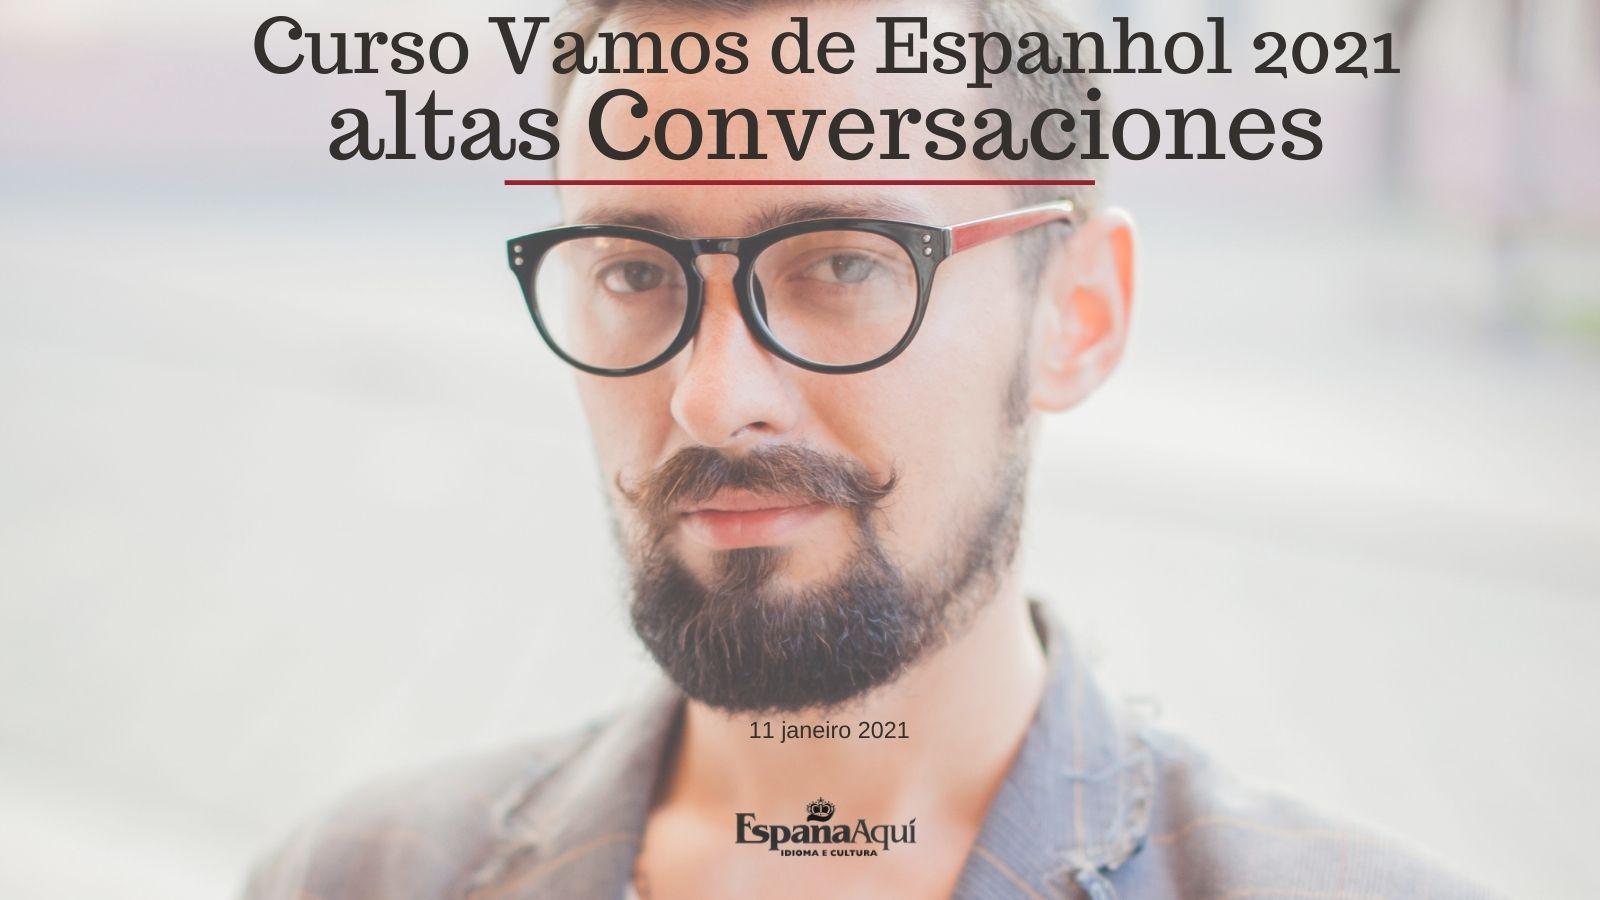 http://www.espanaaqui.com.br/pdf/dezembro2020/altas%20Conversaciones%20twitter%202021.jpg